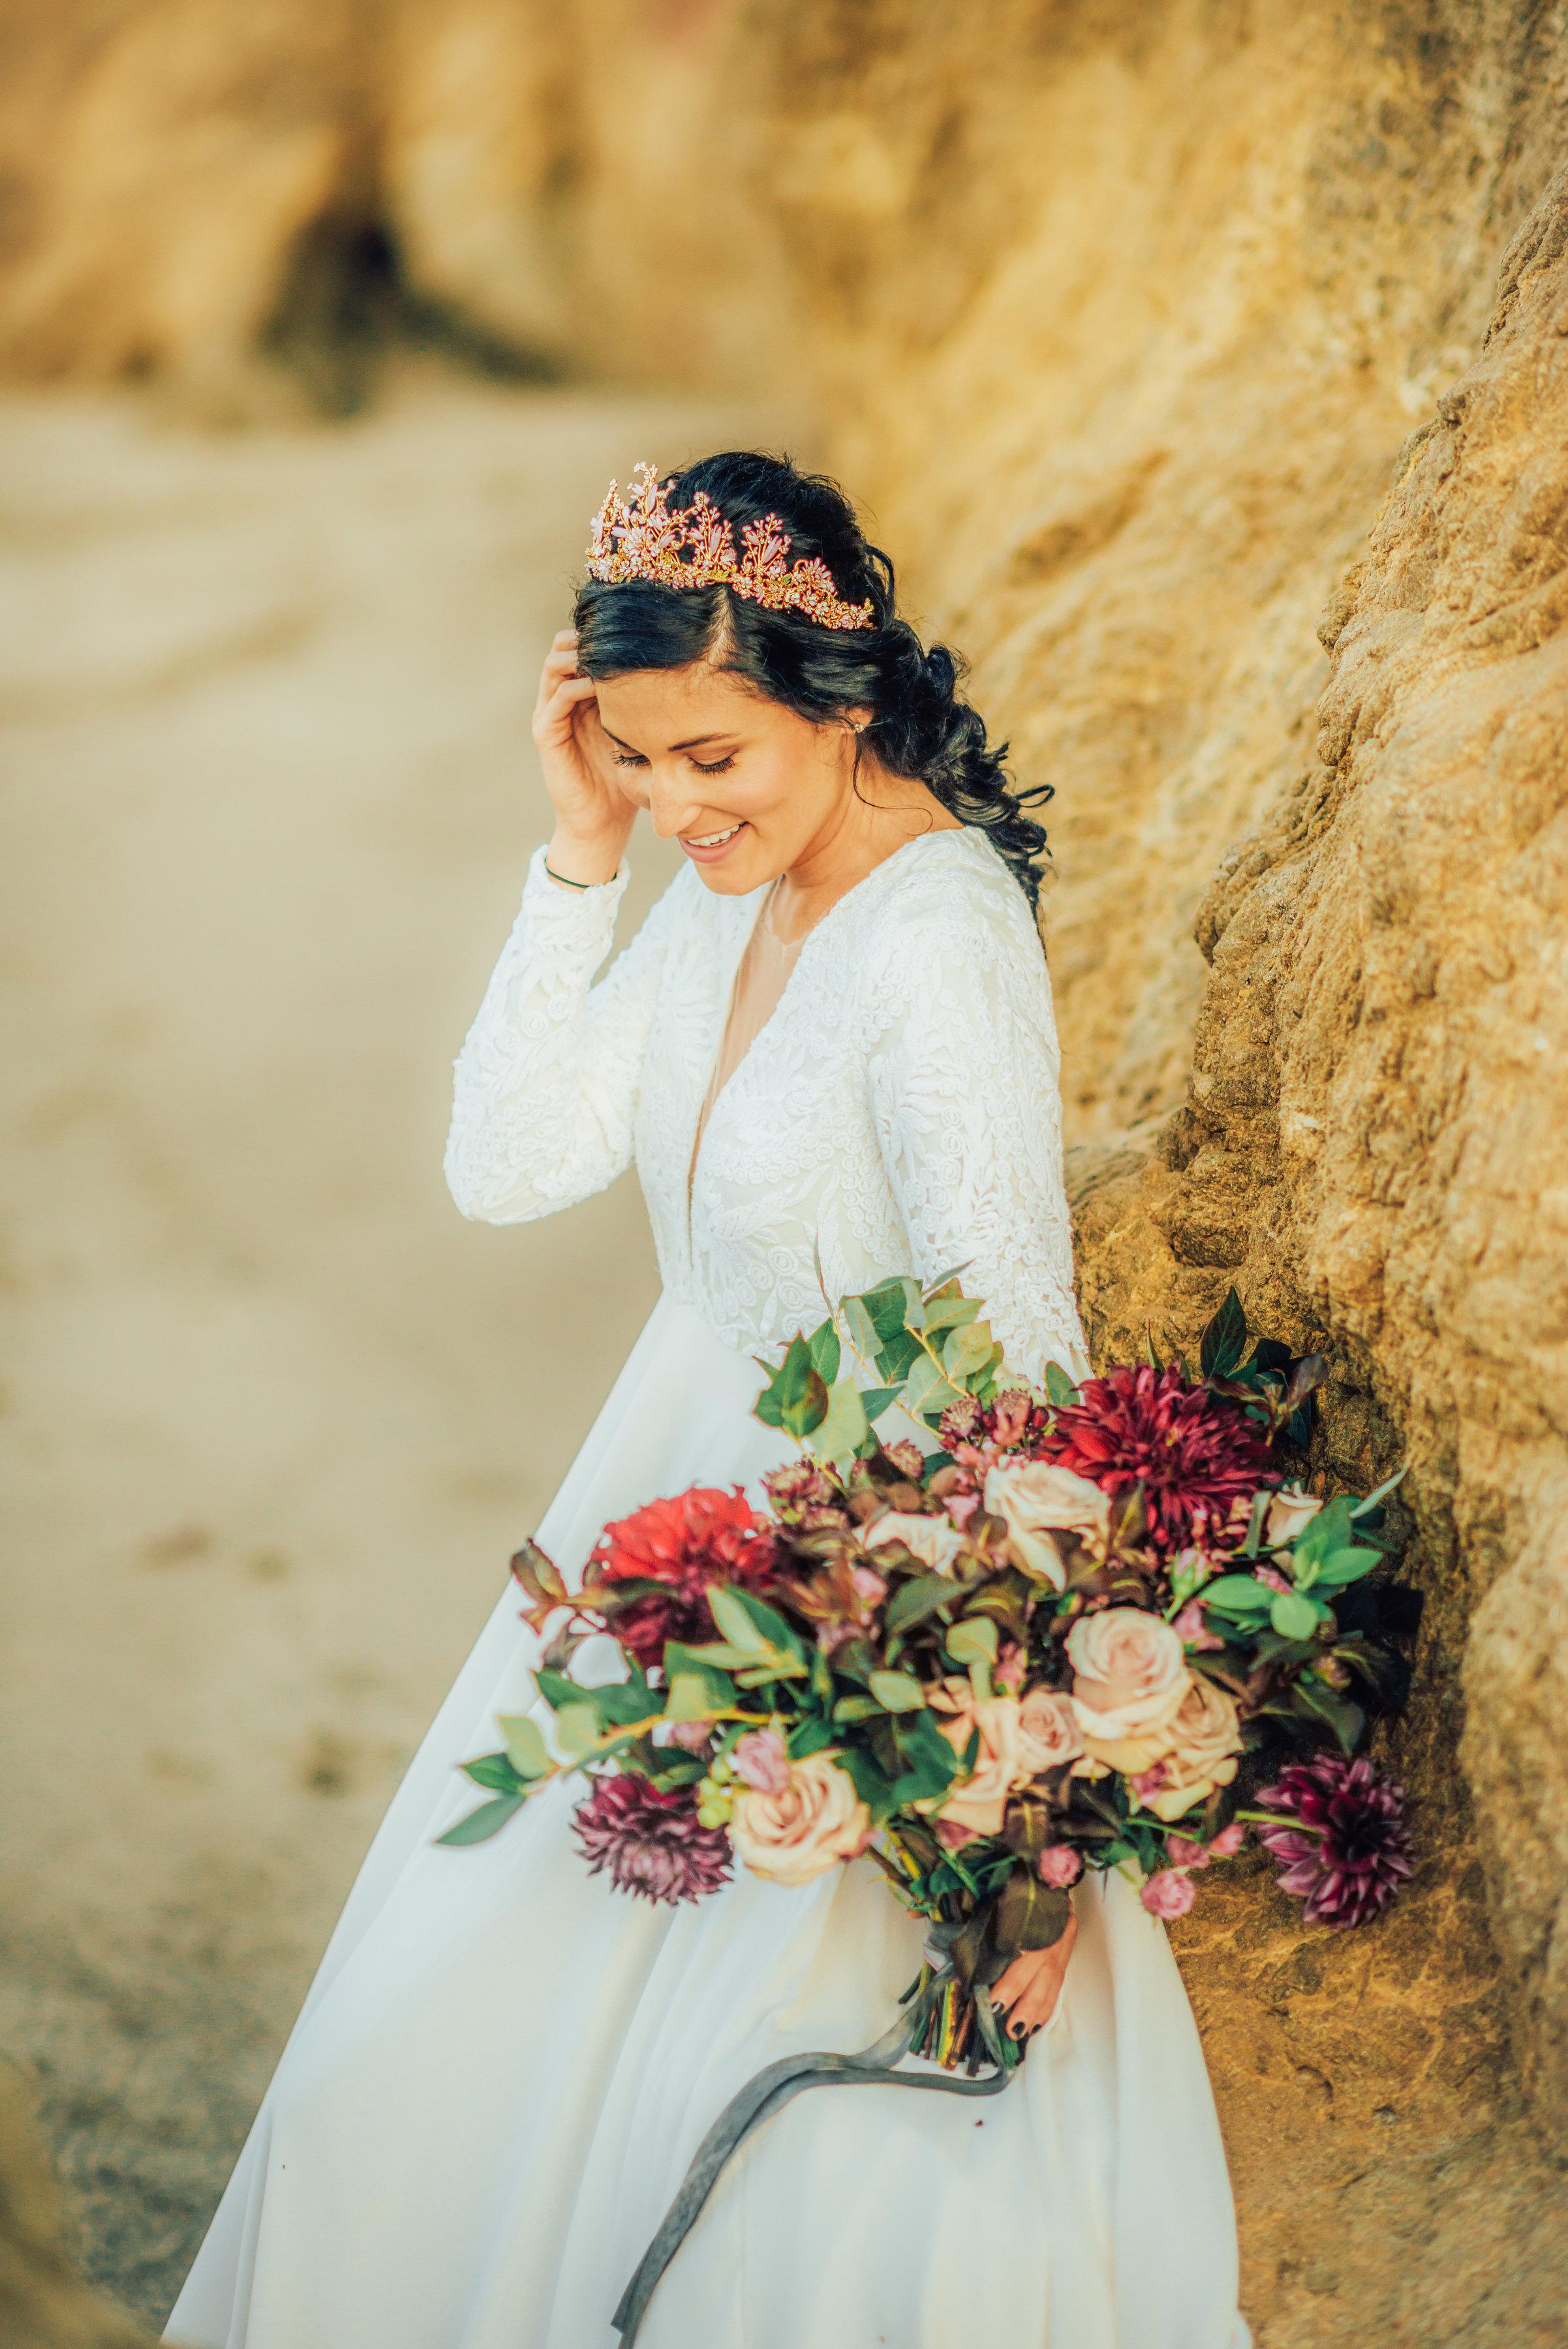 Elopement_Flowers_Sibyl_Sophia_Moody_Garden-Florals_Bride.jpg